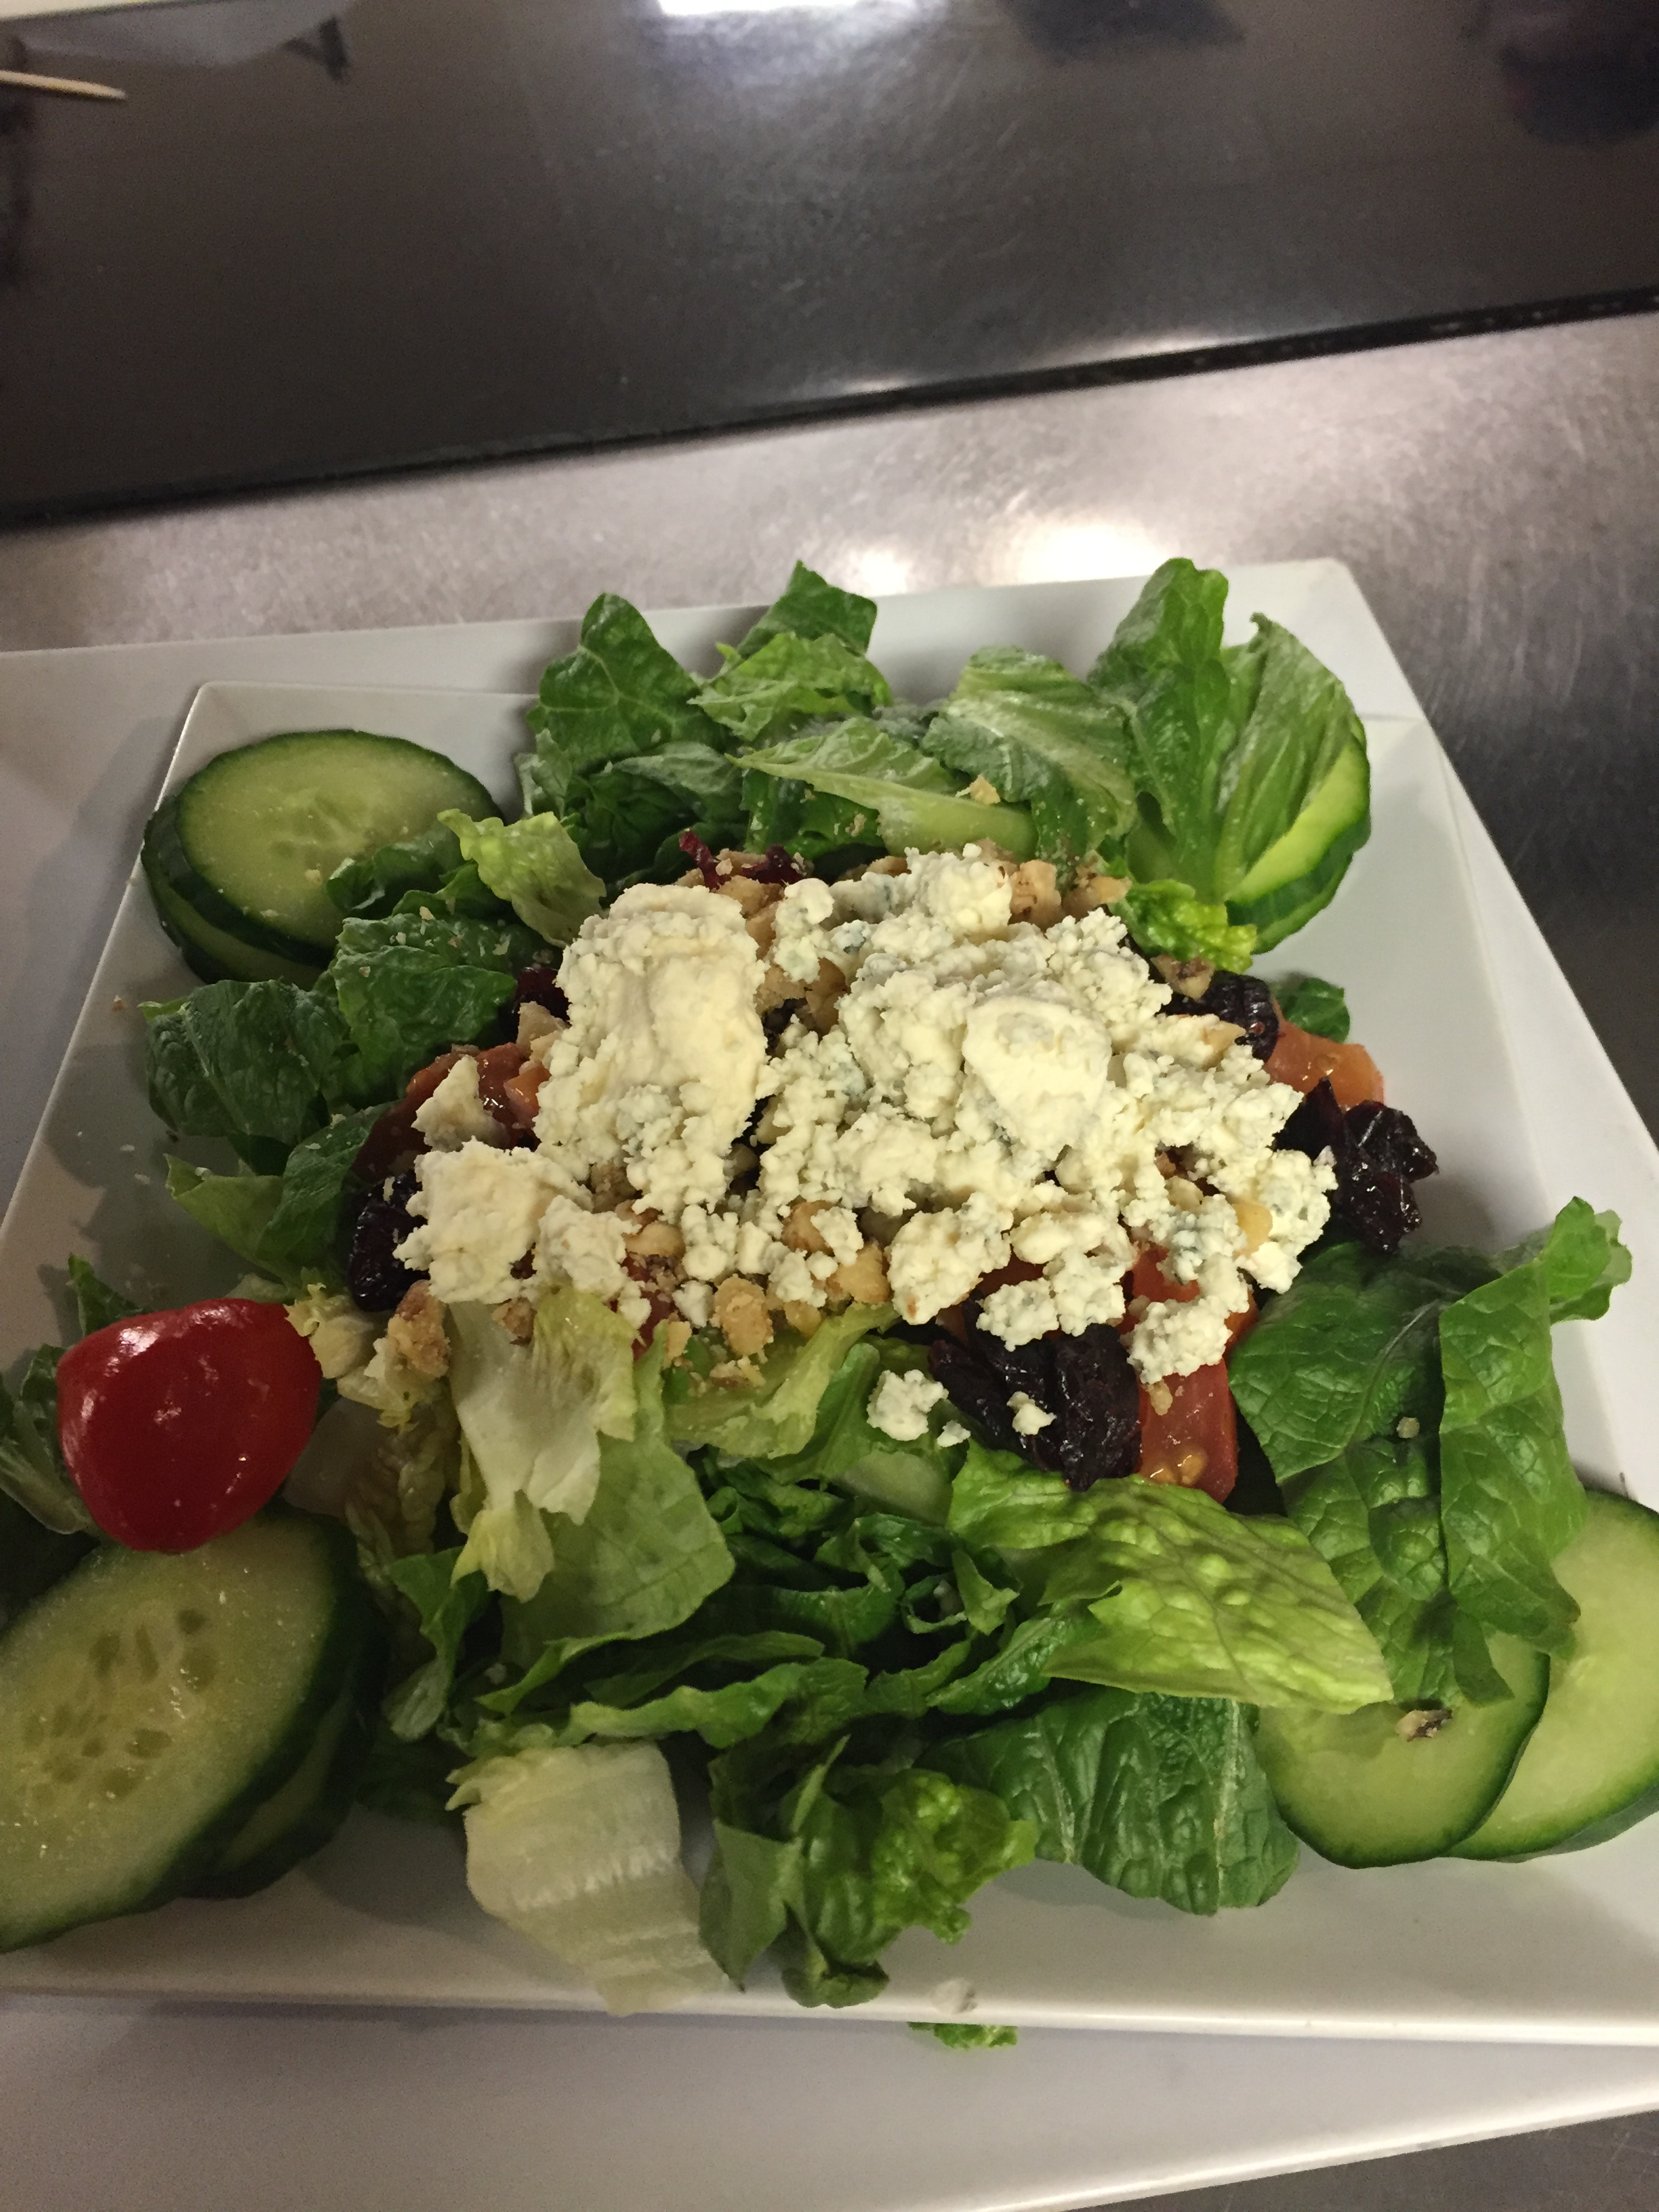 Raspberry & Walnut Salad Image